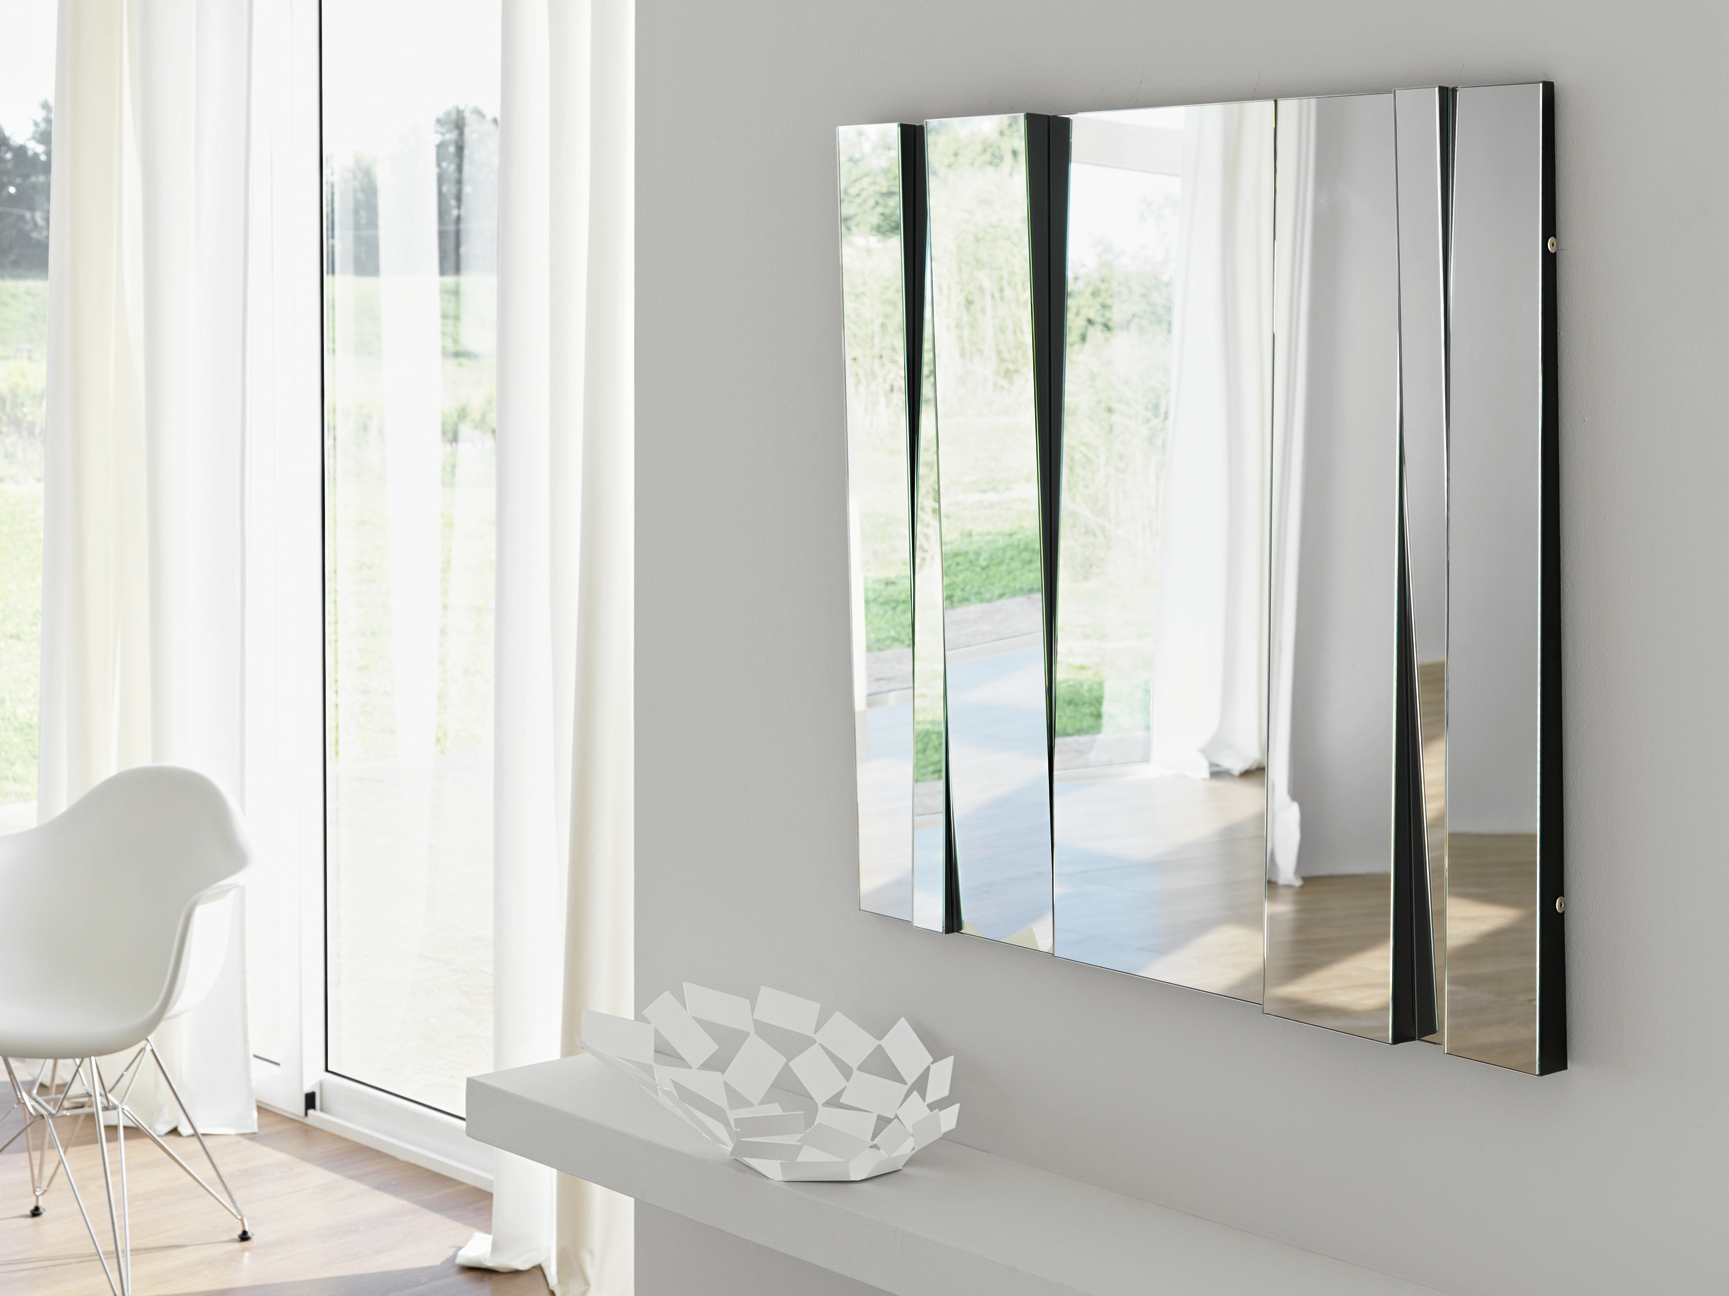 Espejo rectangular de pared fittipaldi by t d tonelli - Espejos para pared ...